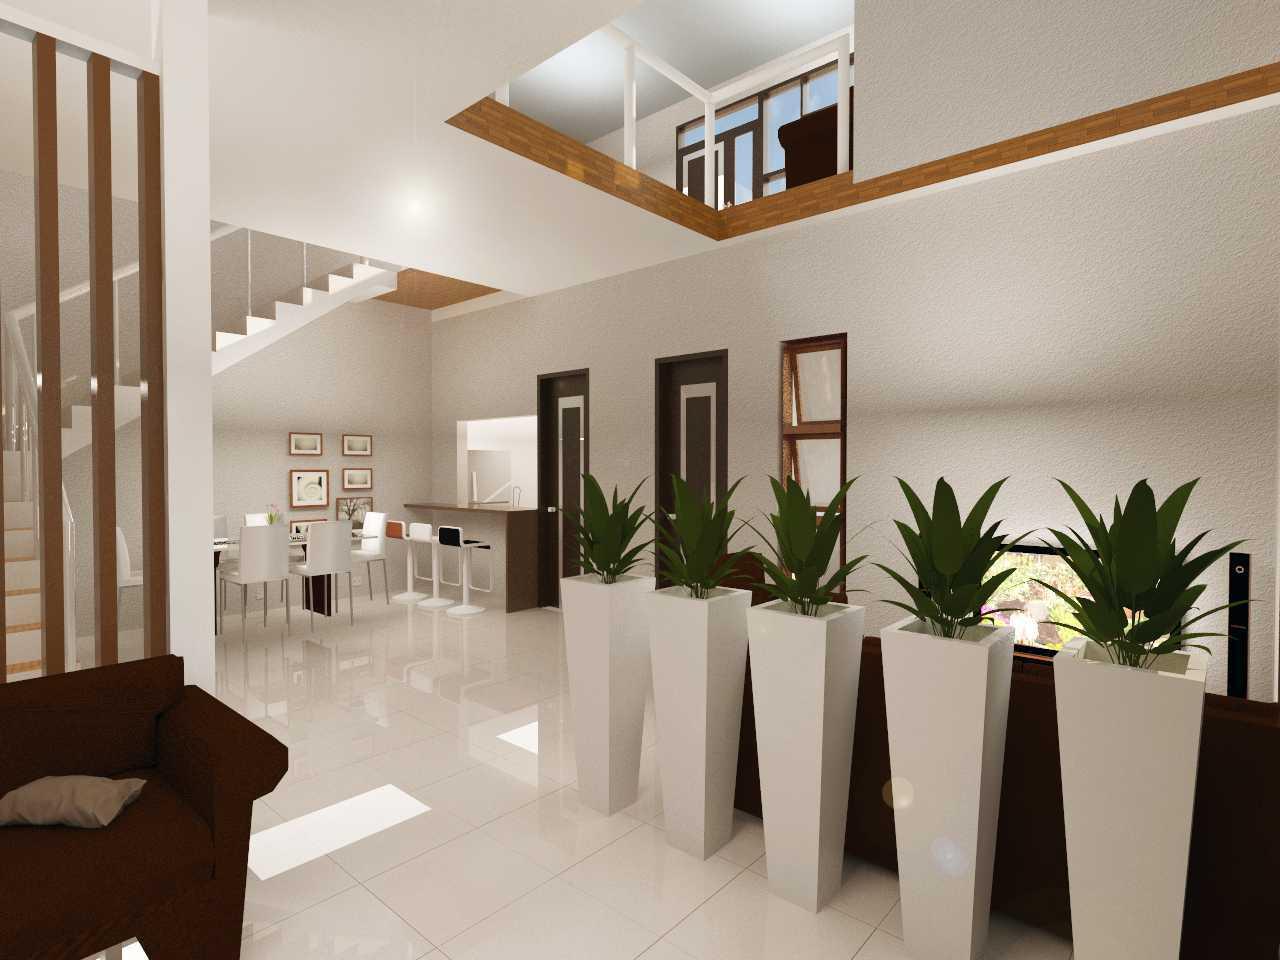 Archdesignbuild7 Project Rumah Tinggal 2 Lantai  Cimekar, Jatihandap Bandung Cimekar, Jatihandap Bandung Interior Modern  13445